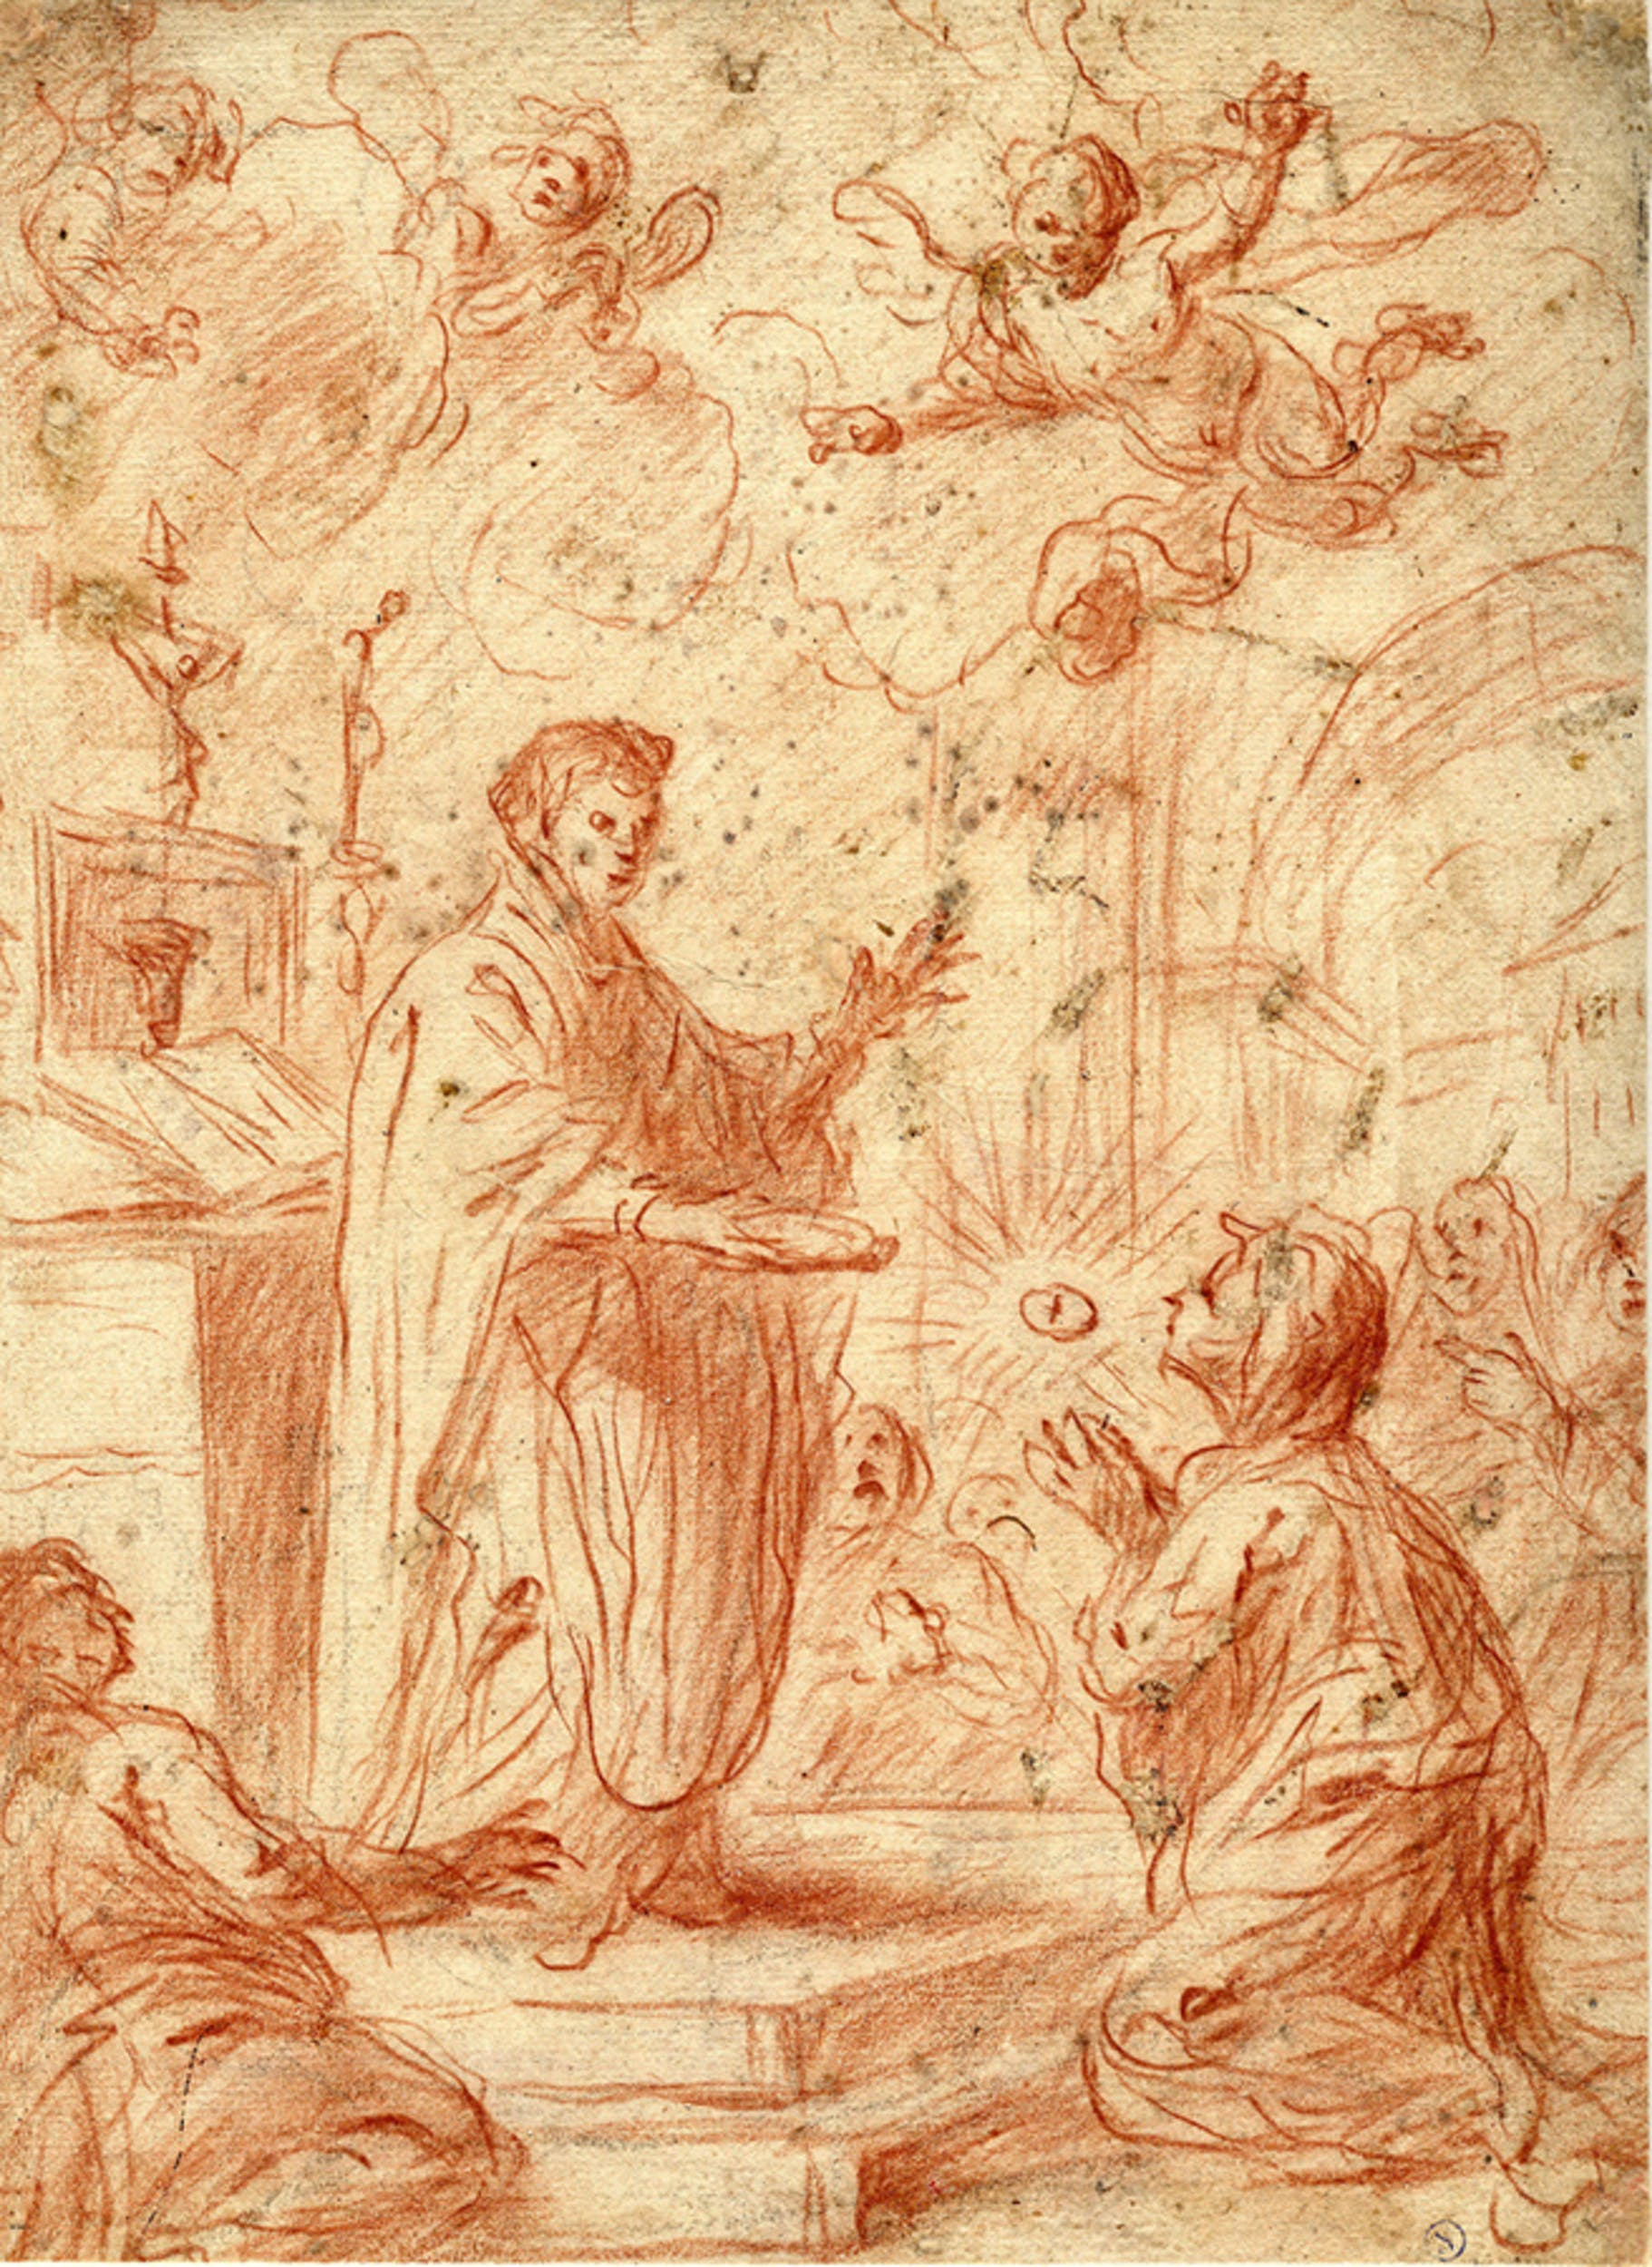 Giovanni Bilivert (Firenze 1585-1644) (attr.), Santa Teresa riceve l'Eucarestia, pietra rossa su carta